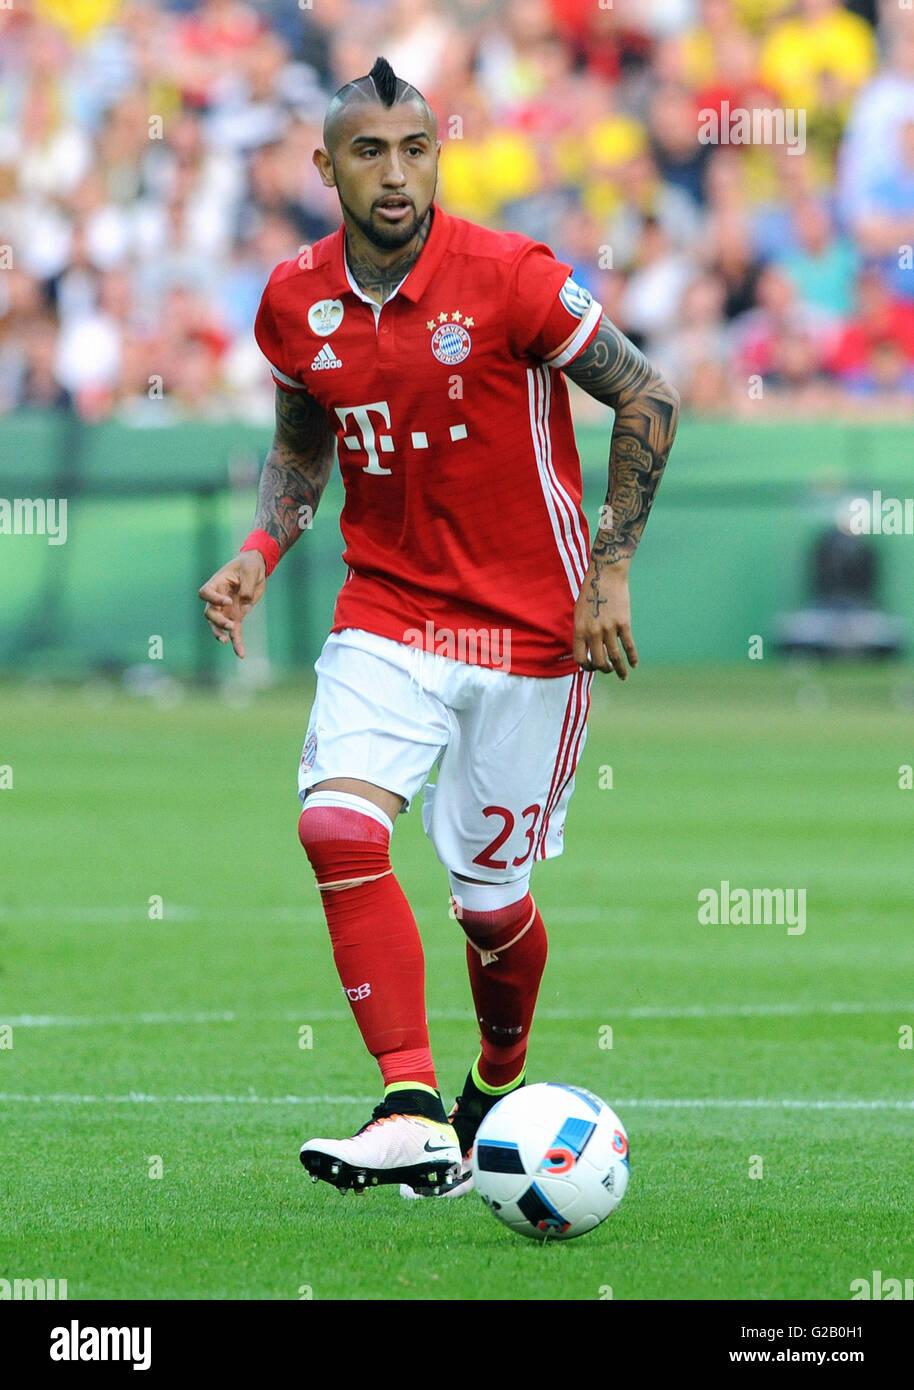 German Cup Final at Olympic Stadium Berlin, FC Bayern Munich vs Borussia Dortmund: Arturo Vidal of Munich. - Stock Image